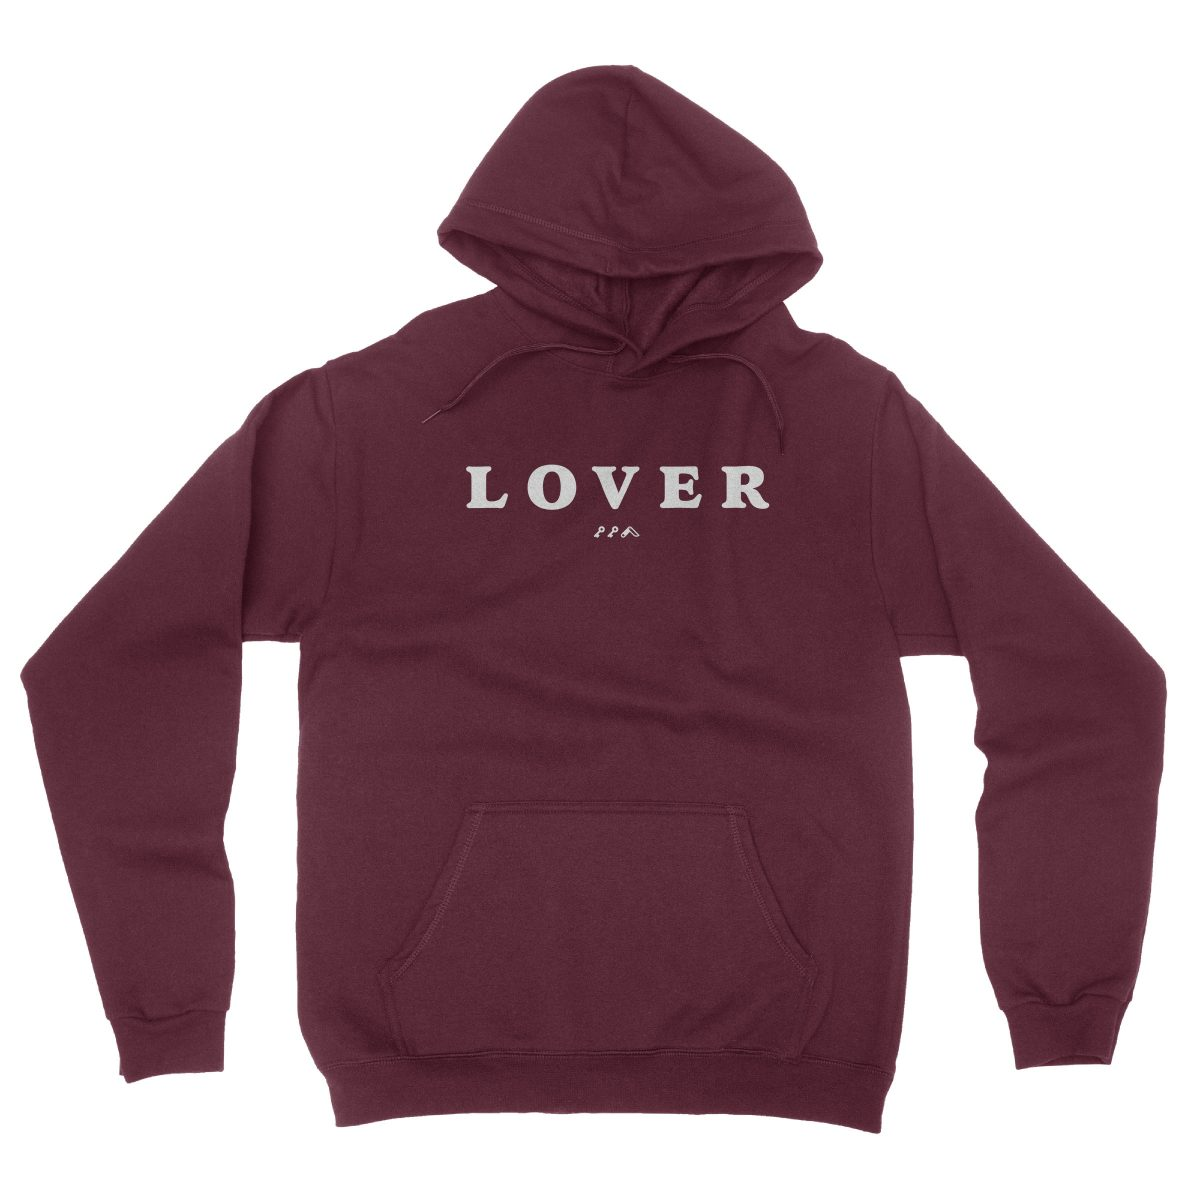 LOVER soft unisex hoodie in maroon by kikicutt